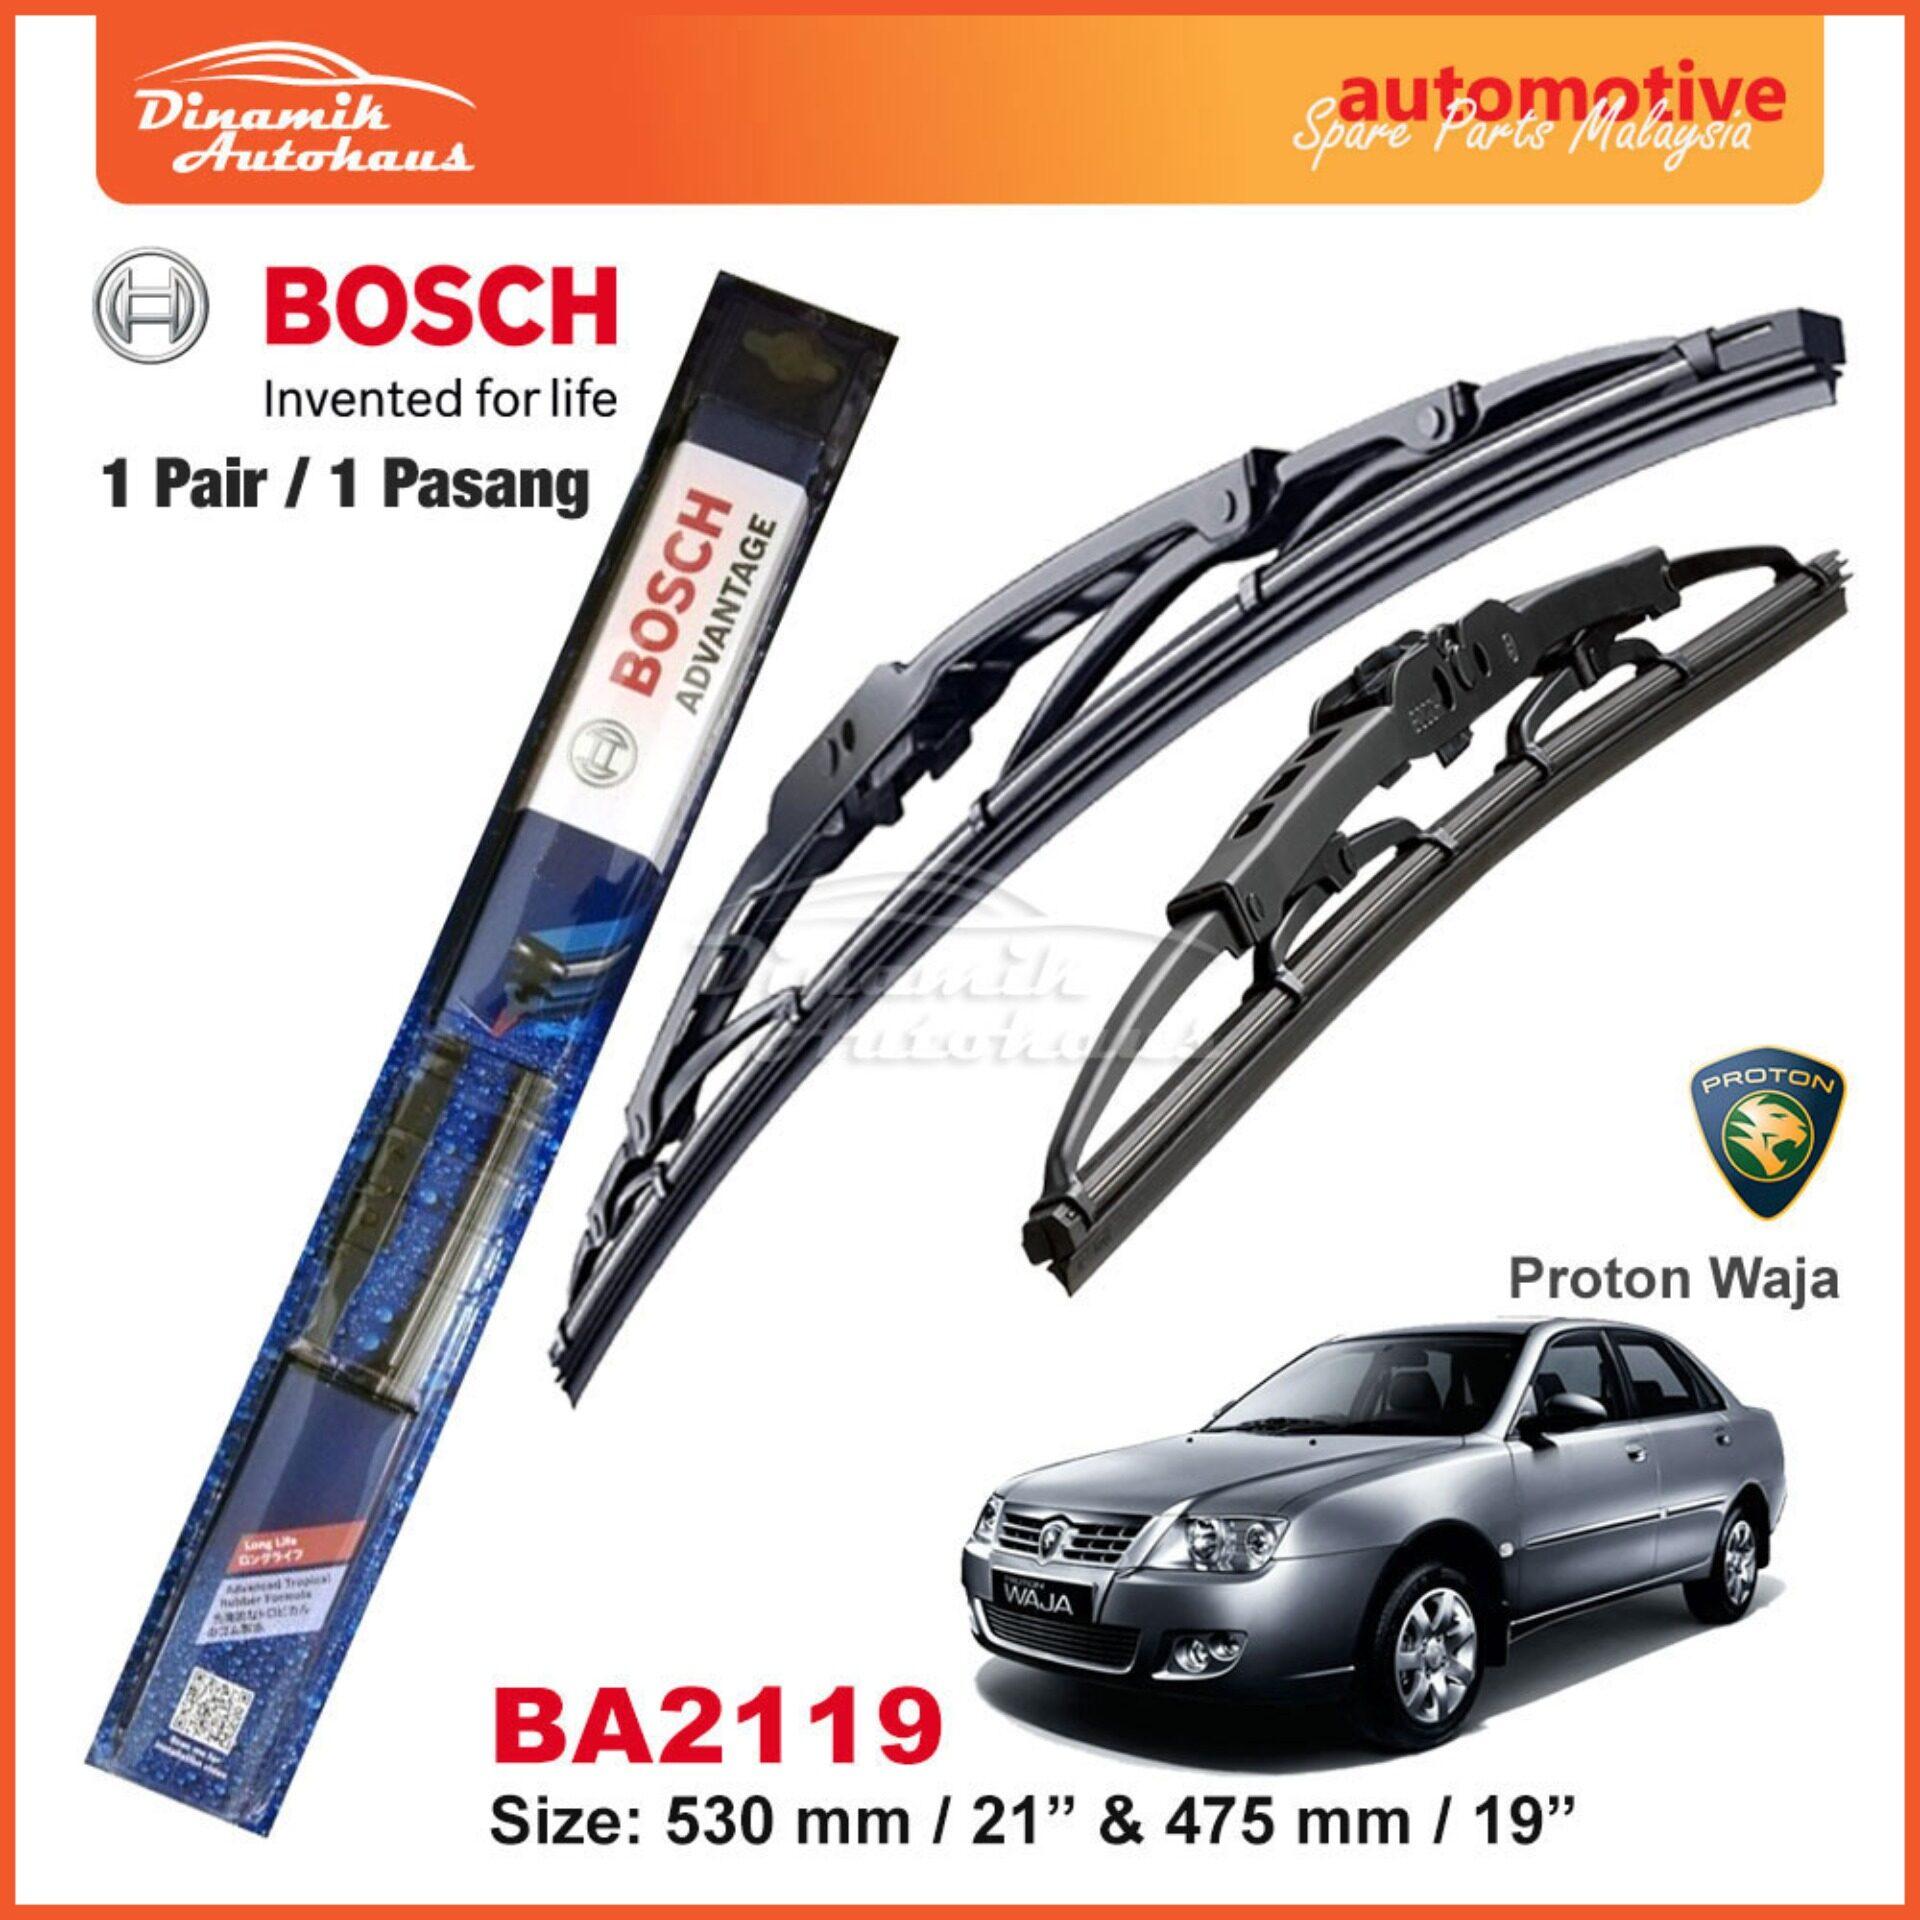 Proton Waja Car Windshield Wiper Blade 21  / 19  Bosch Advantage BA2119